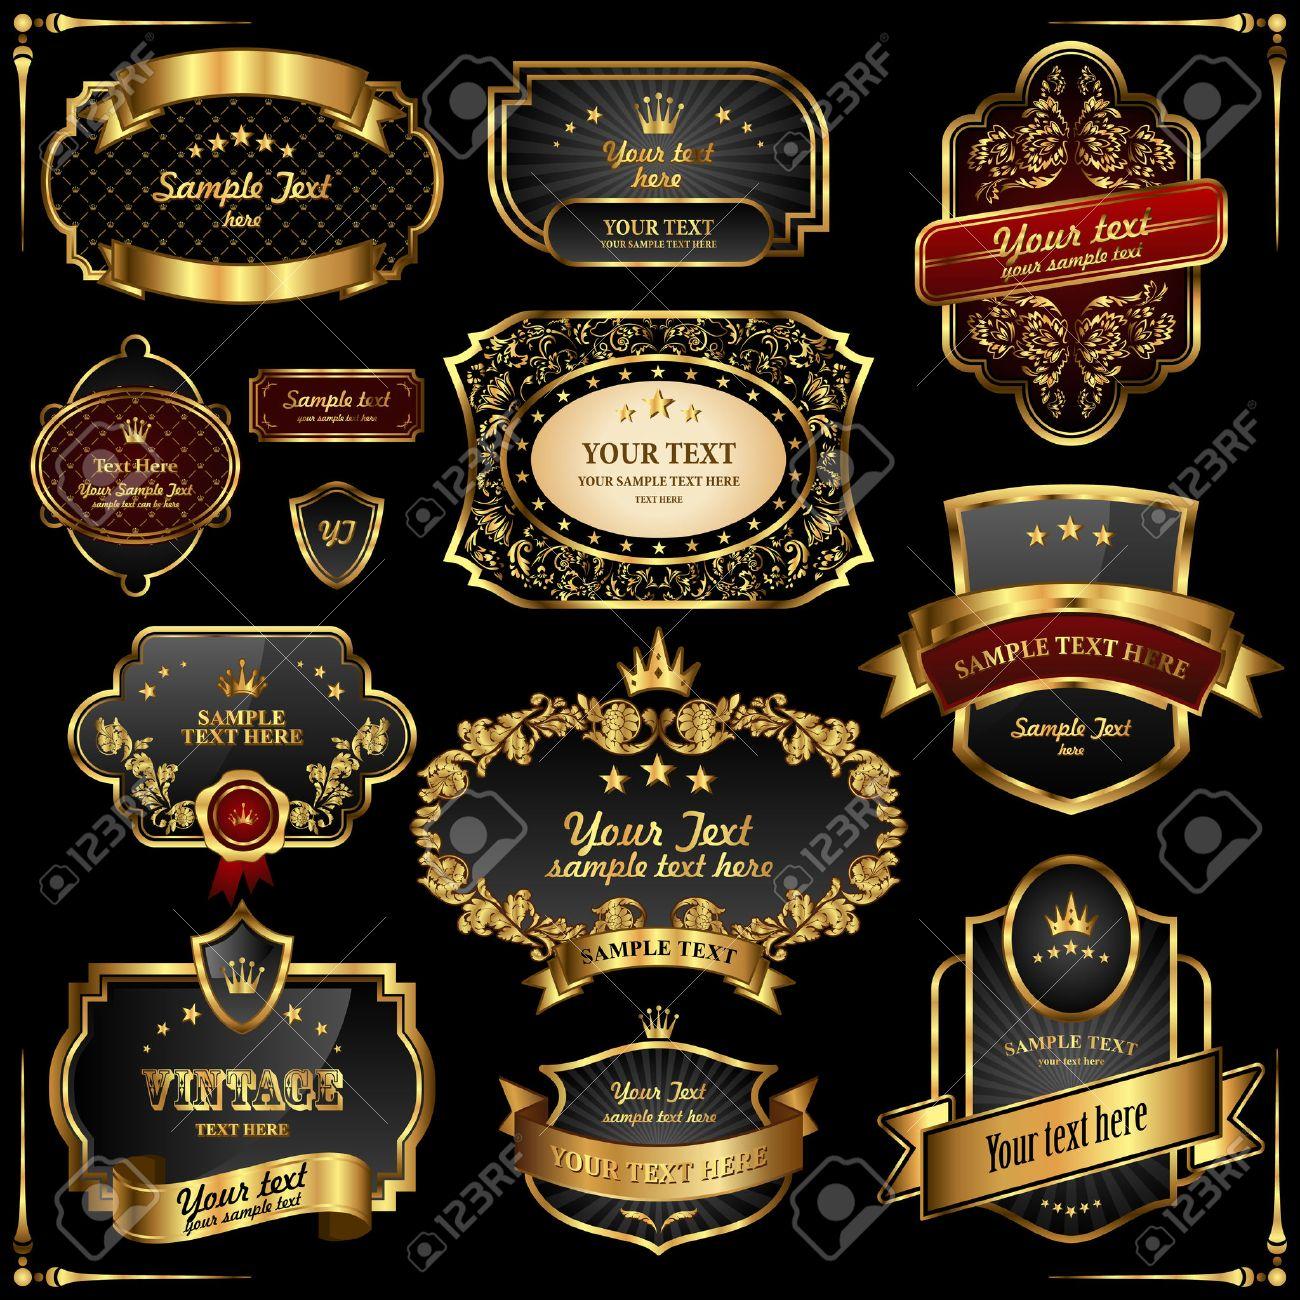 Retro vector gold frames on black background. Premium design elements. Stock Vector - 8497286